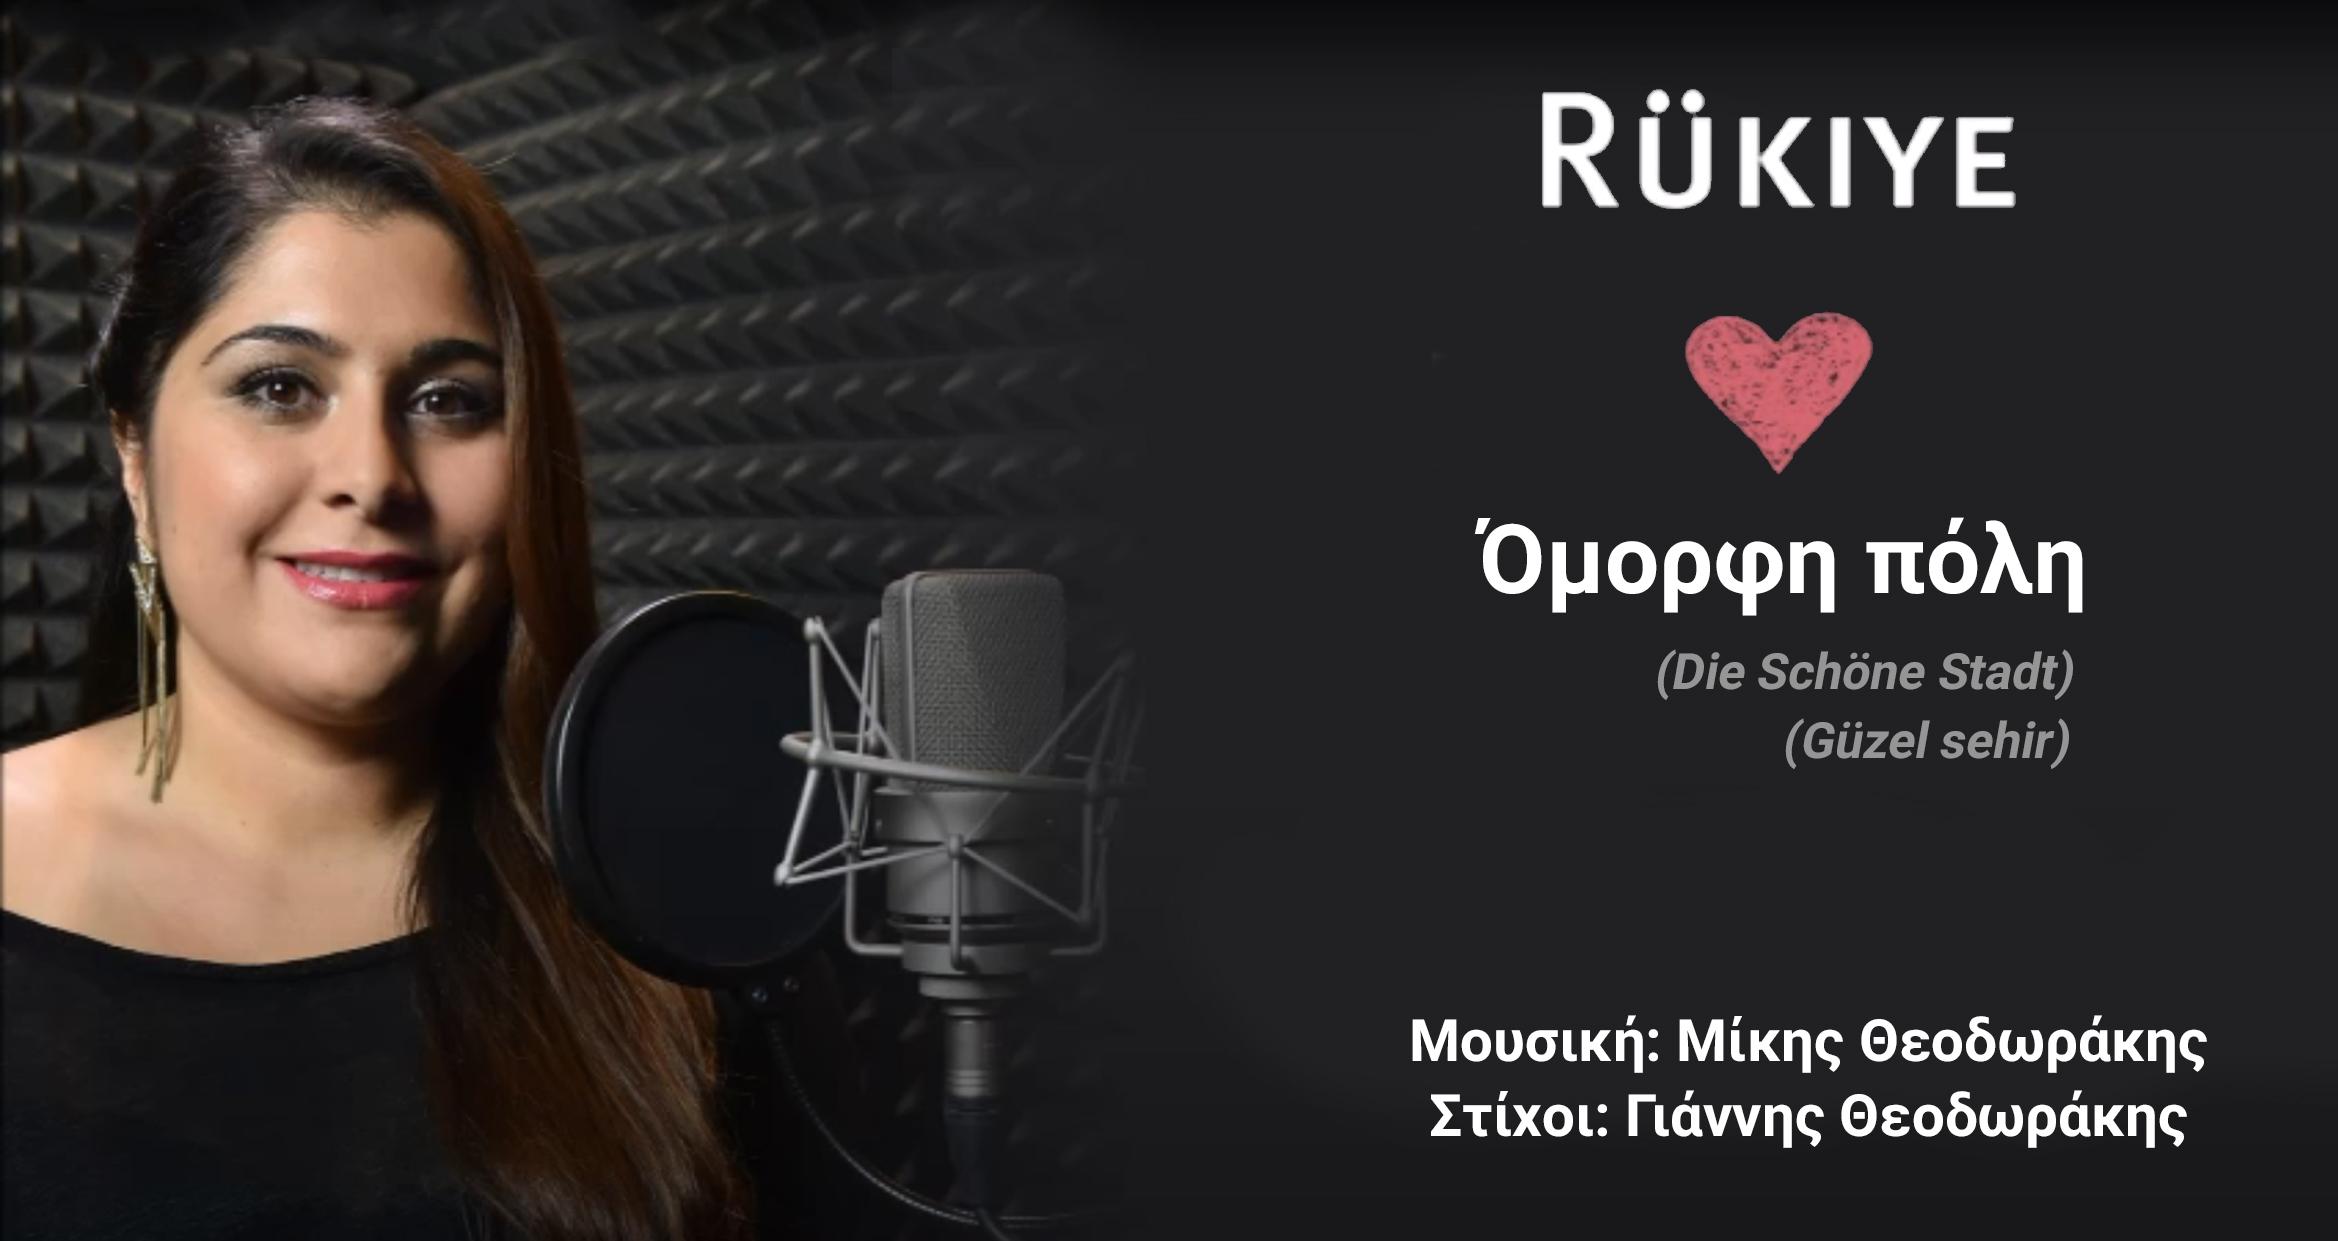 "RUKIYE – ""Όμορφη πόλη"", Μουσική: Μίκης Θεοδωράκης, Στίχοι: Γιάννης Θεοδωράκης"